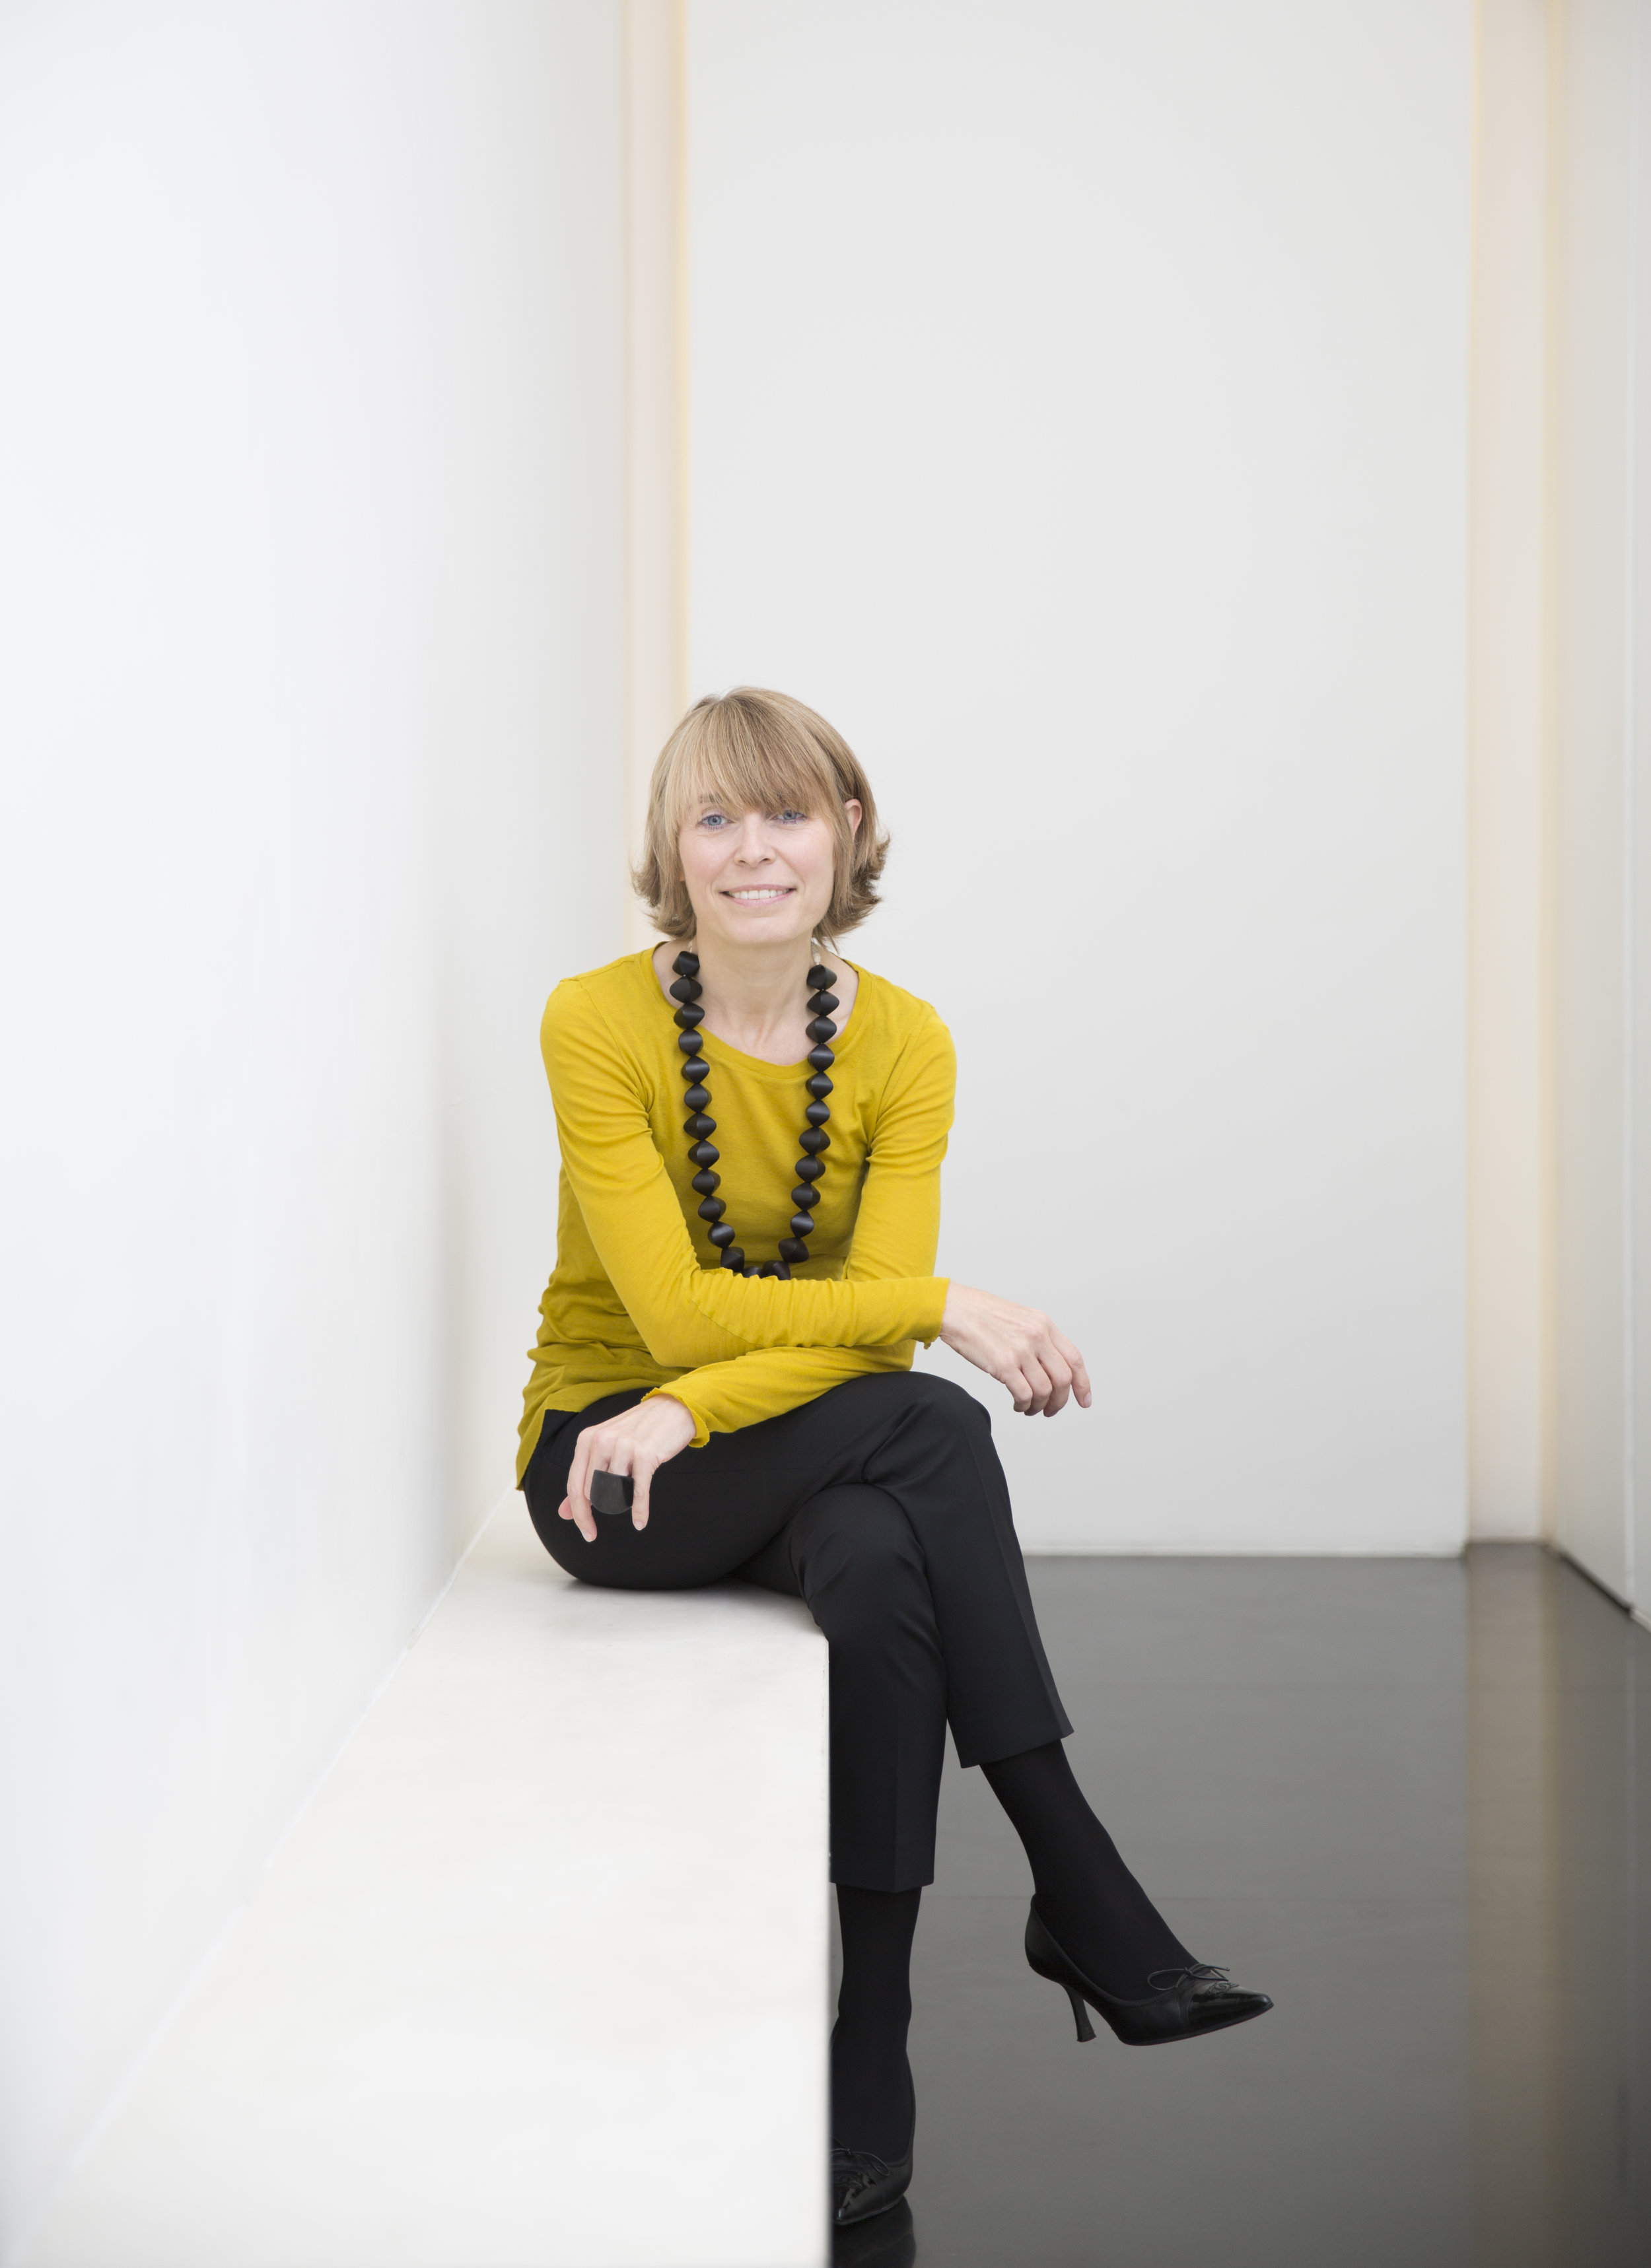 Axelle De Buffevent, Creative Director at Perrier-Jou ë t